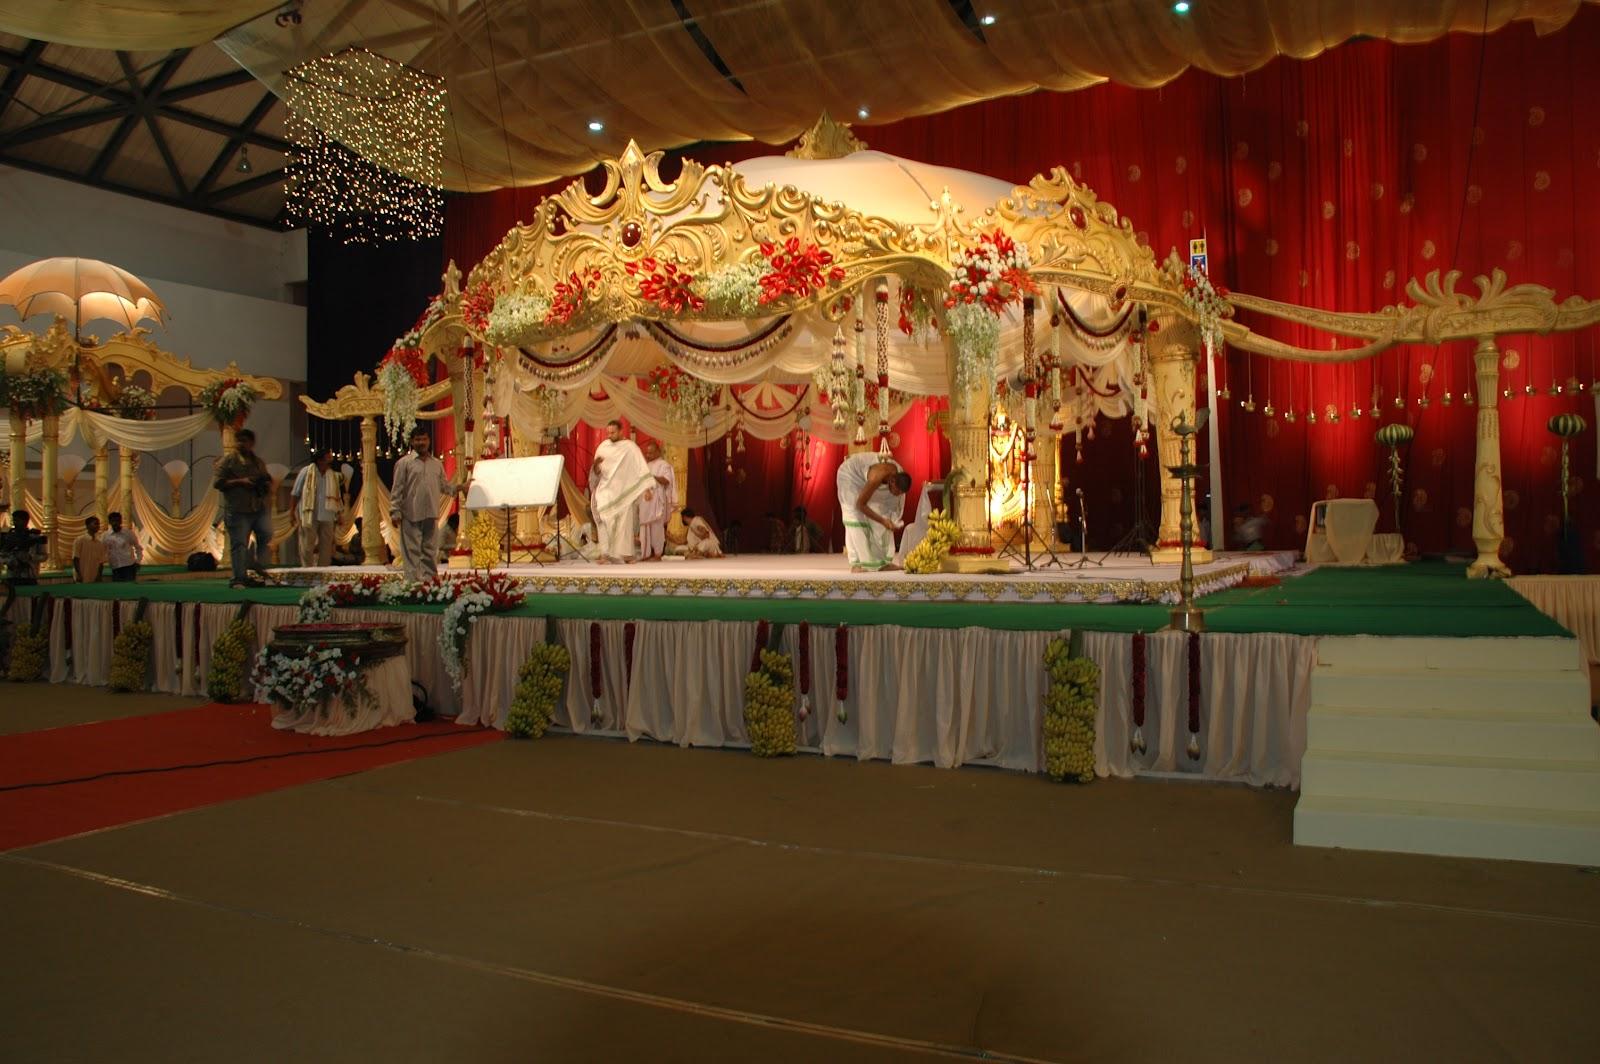 Indian Wedding Stage Sets designs